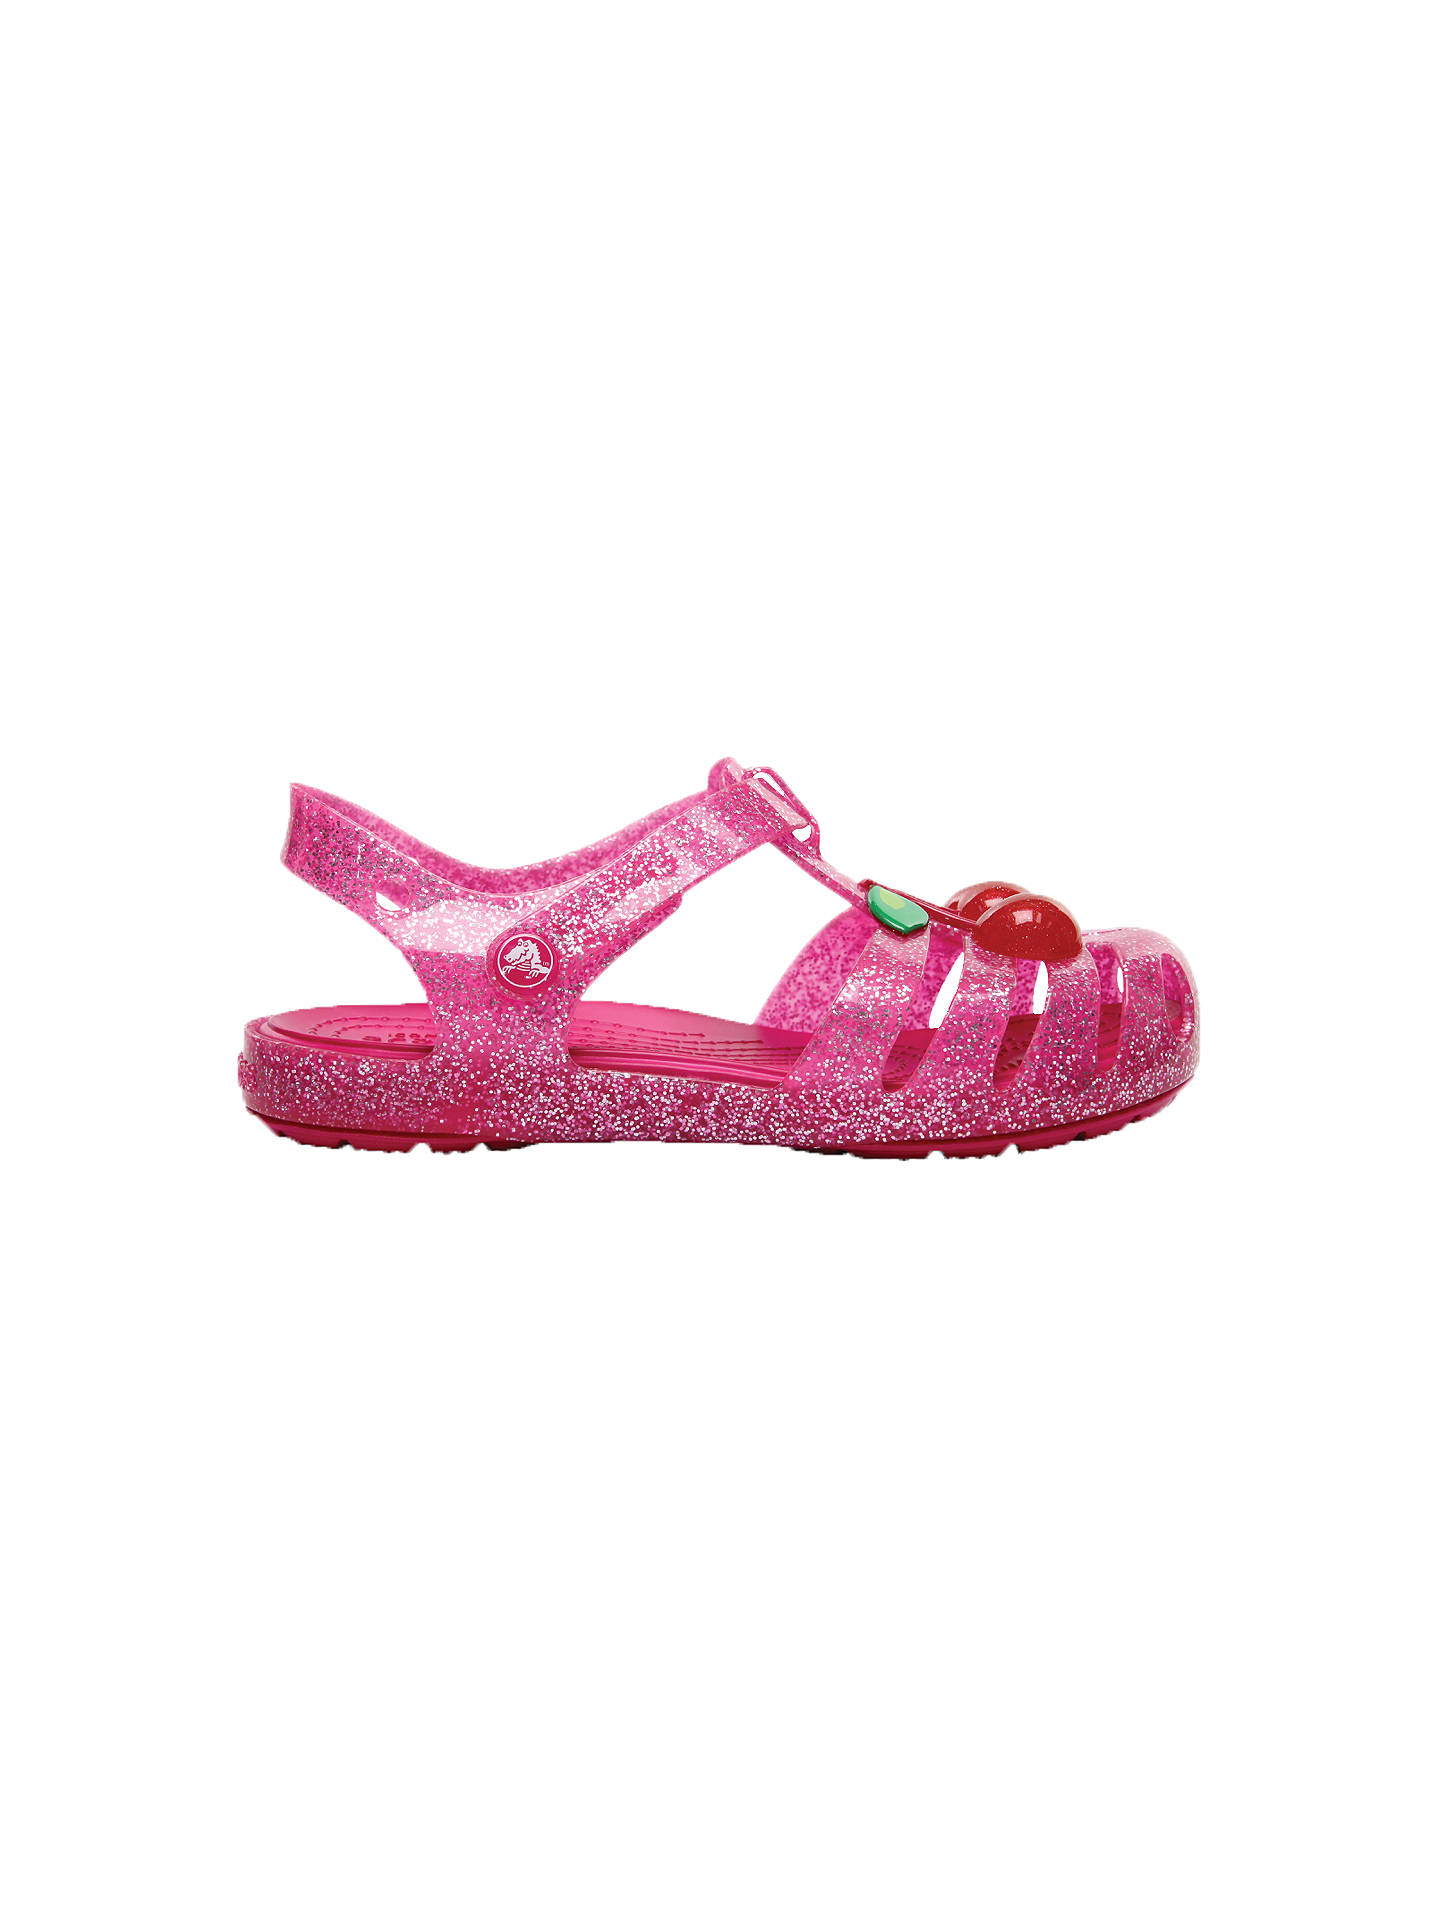 be7c25464da Buy Crocs Children s Isabella Novelty Sandals